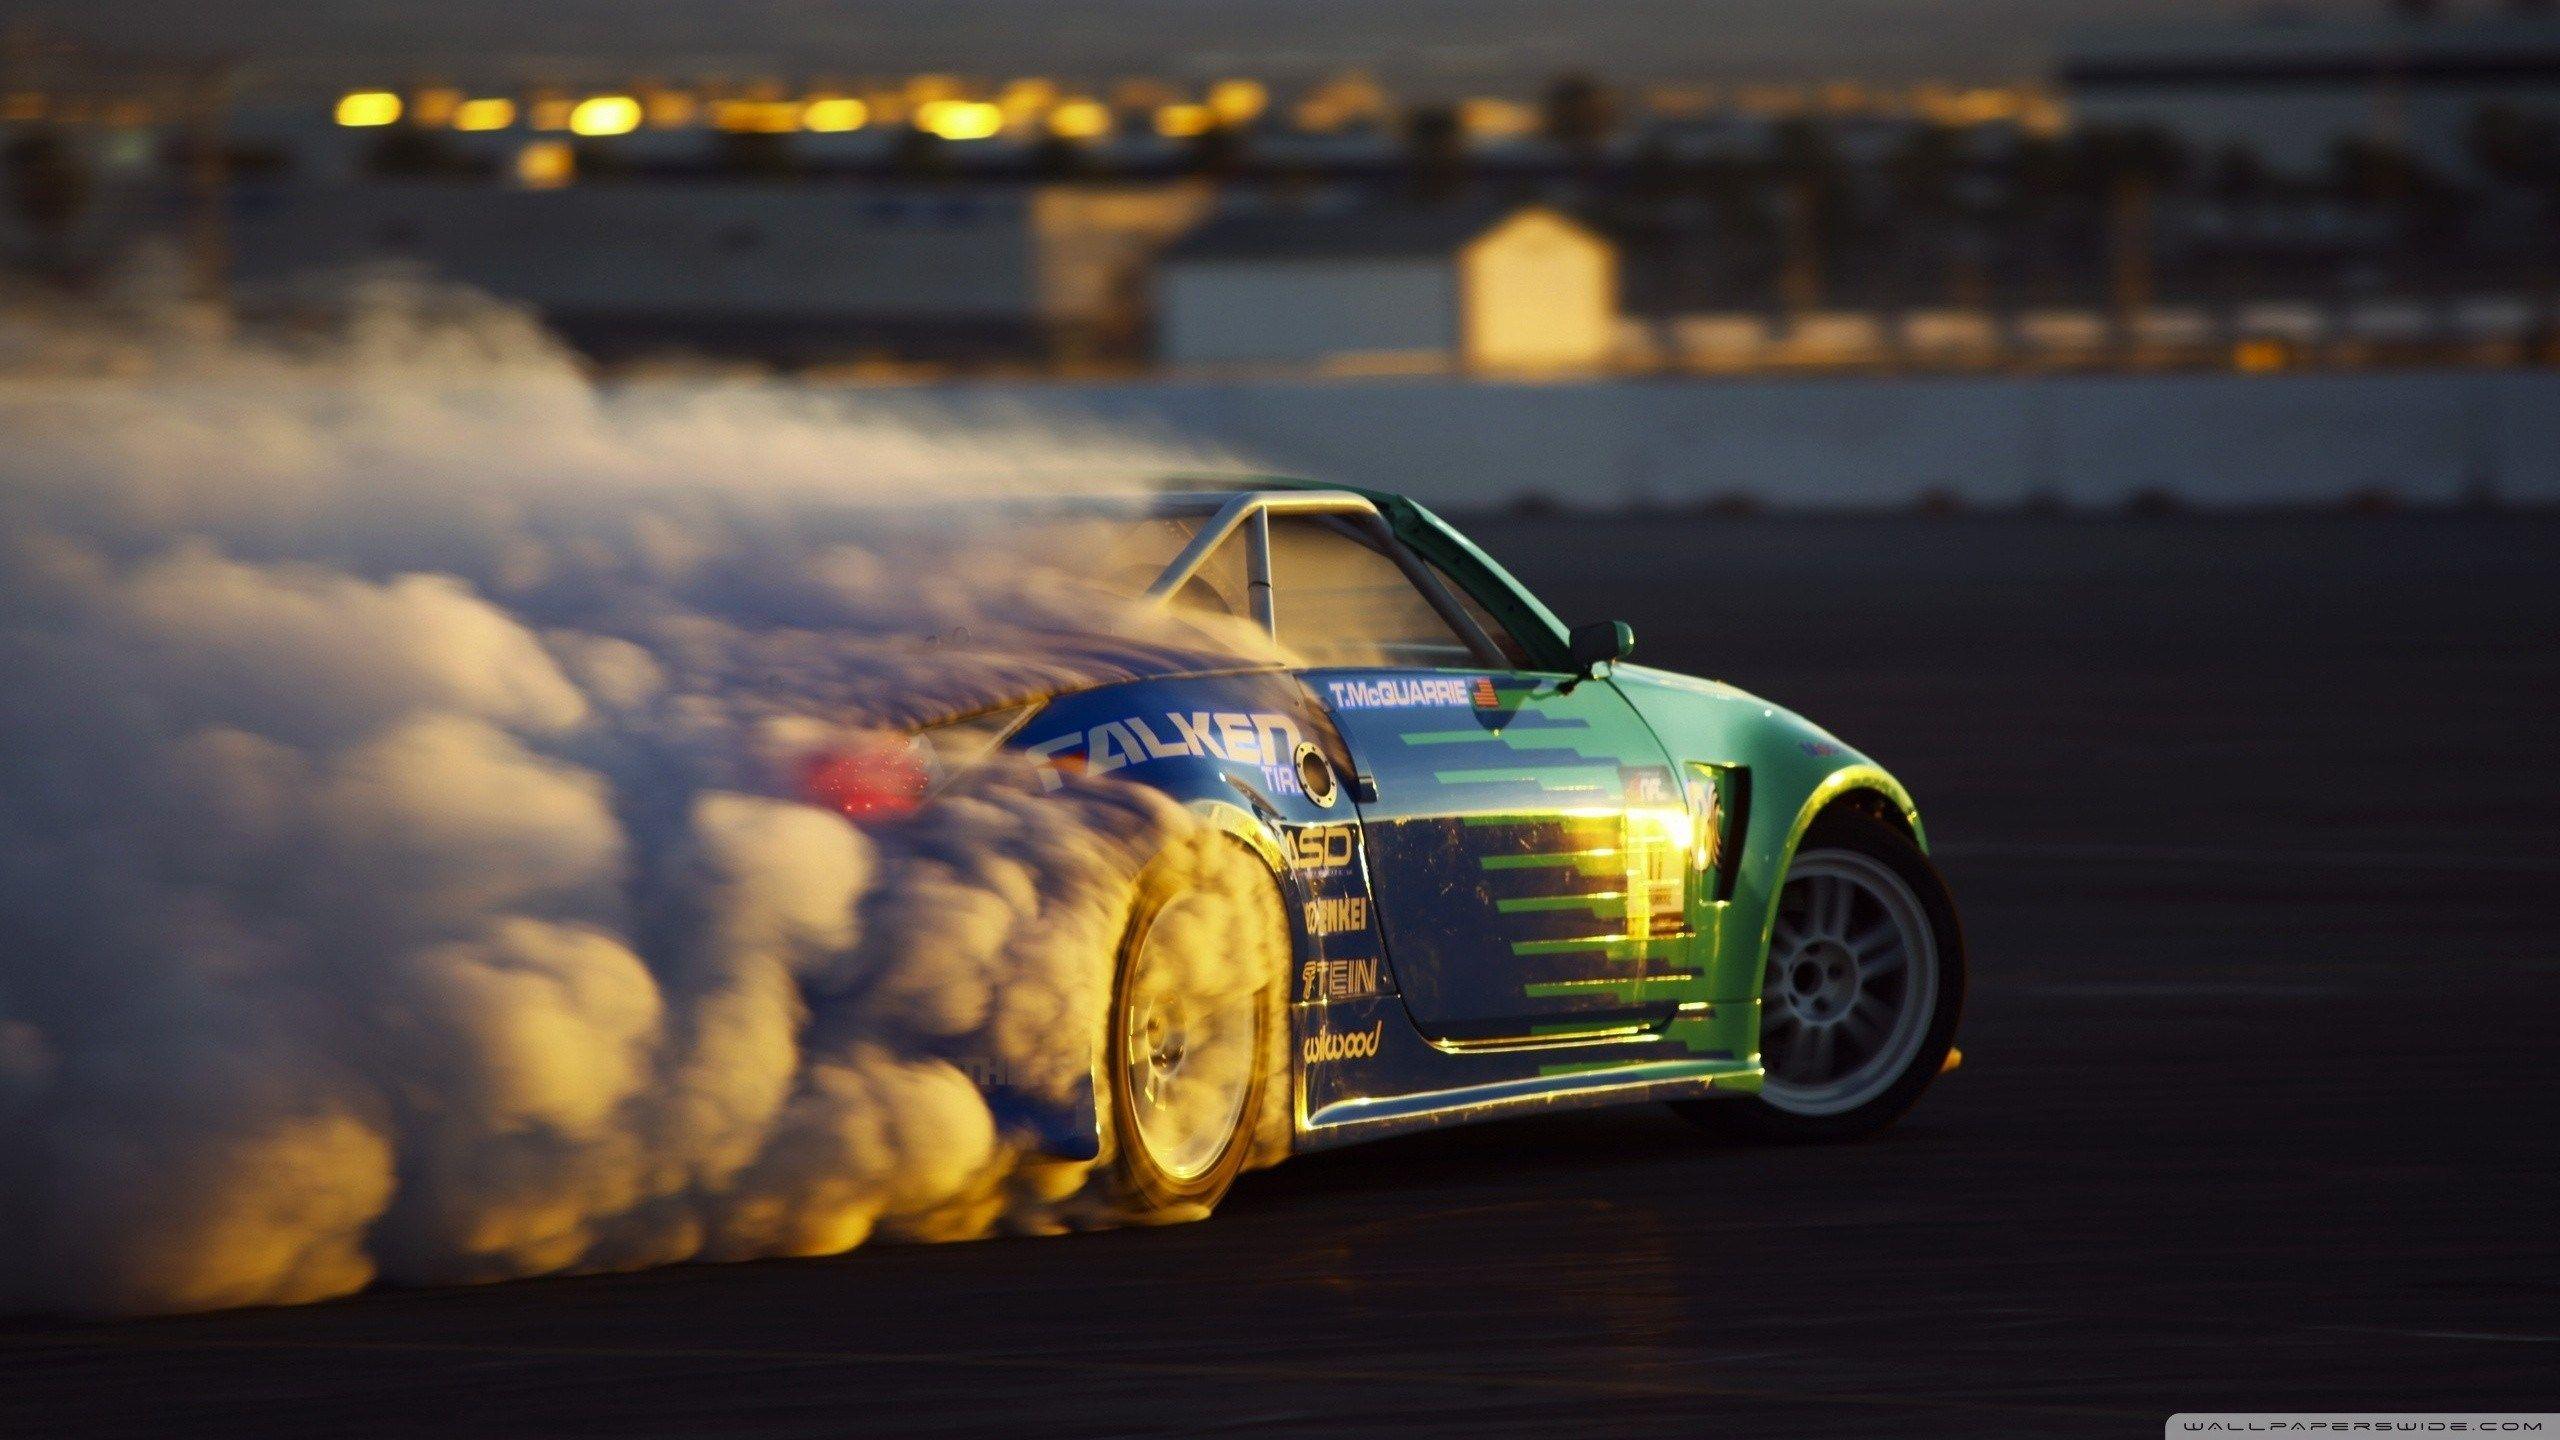 Nissan 350z 1080p Windows Drifting Cars Fast Cars Car Wallpapers